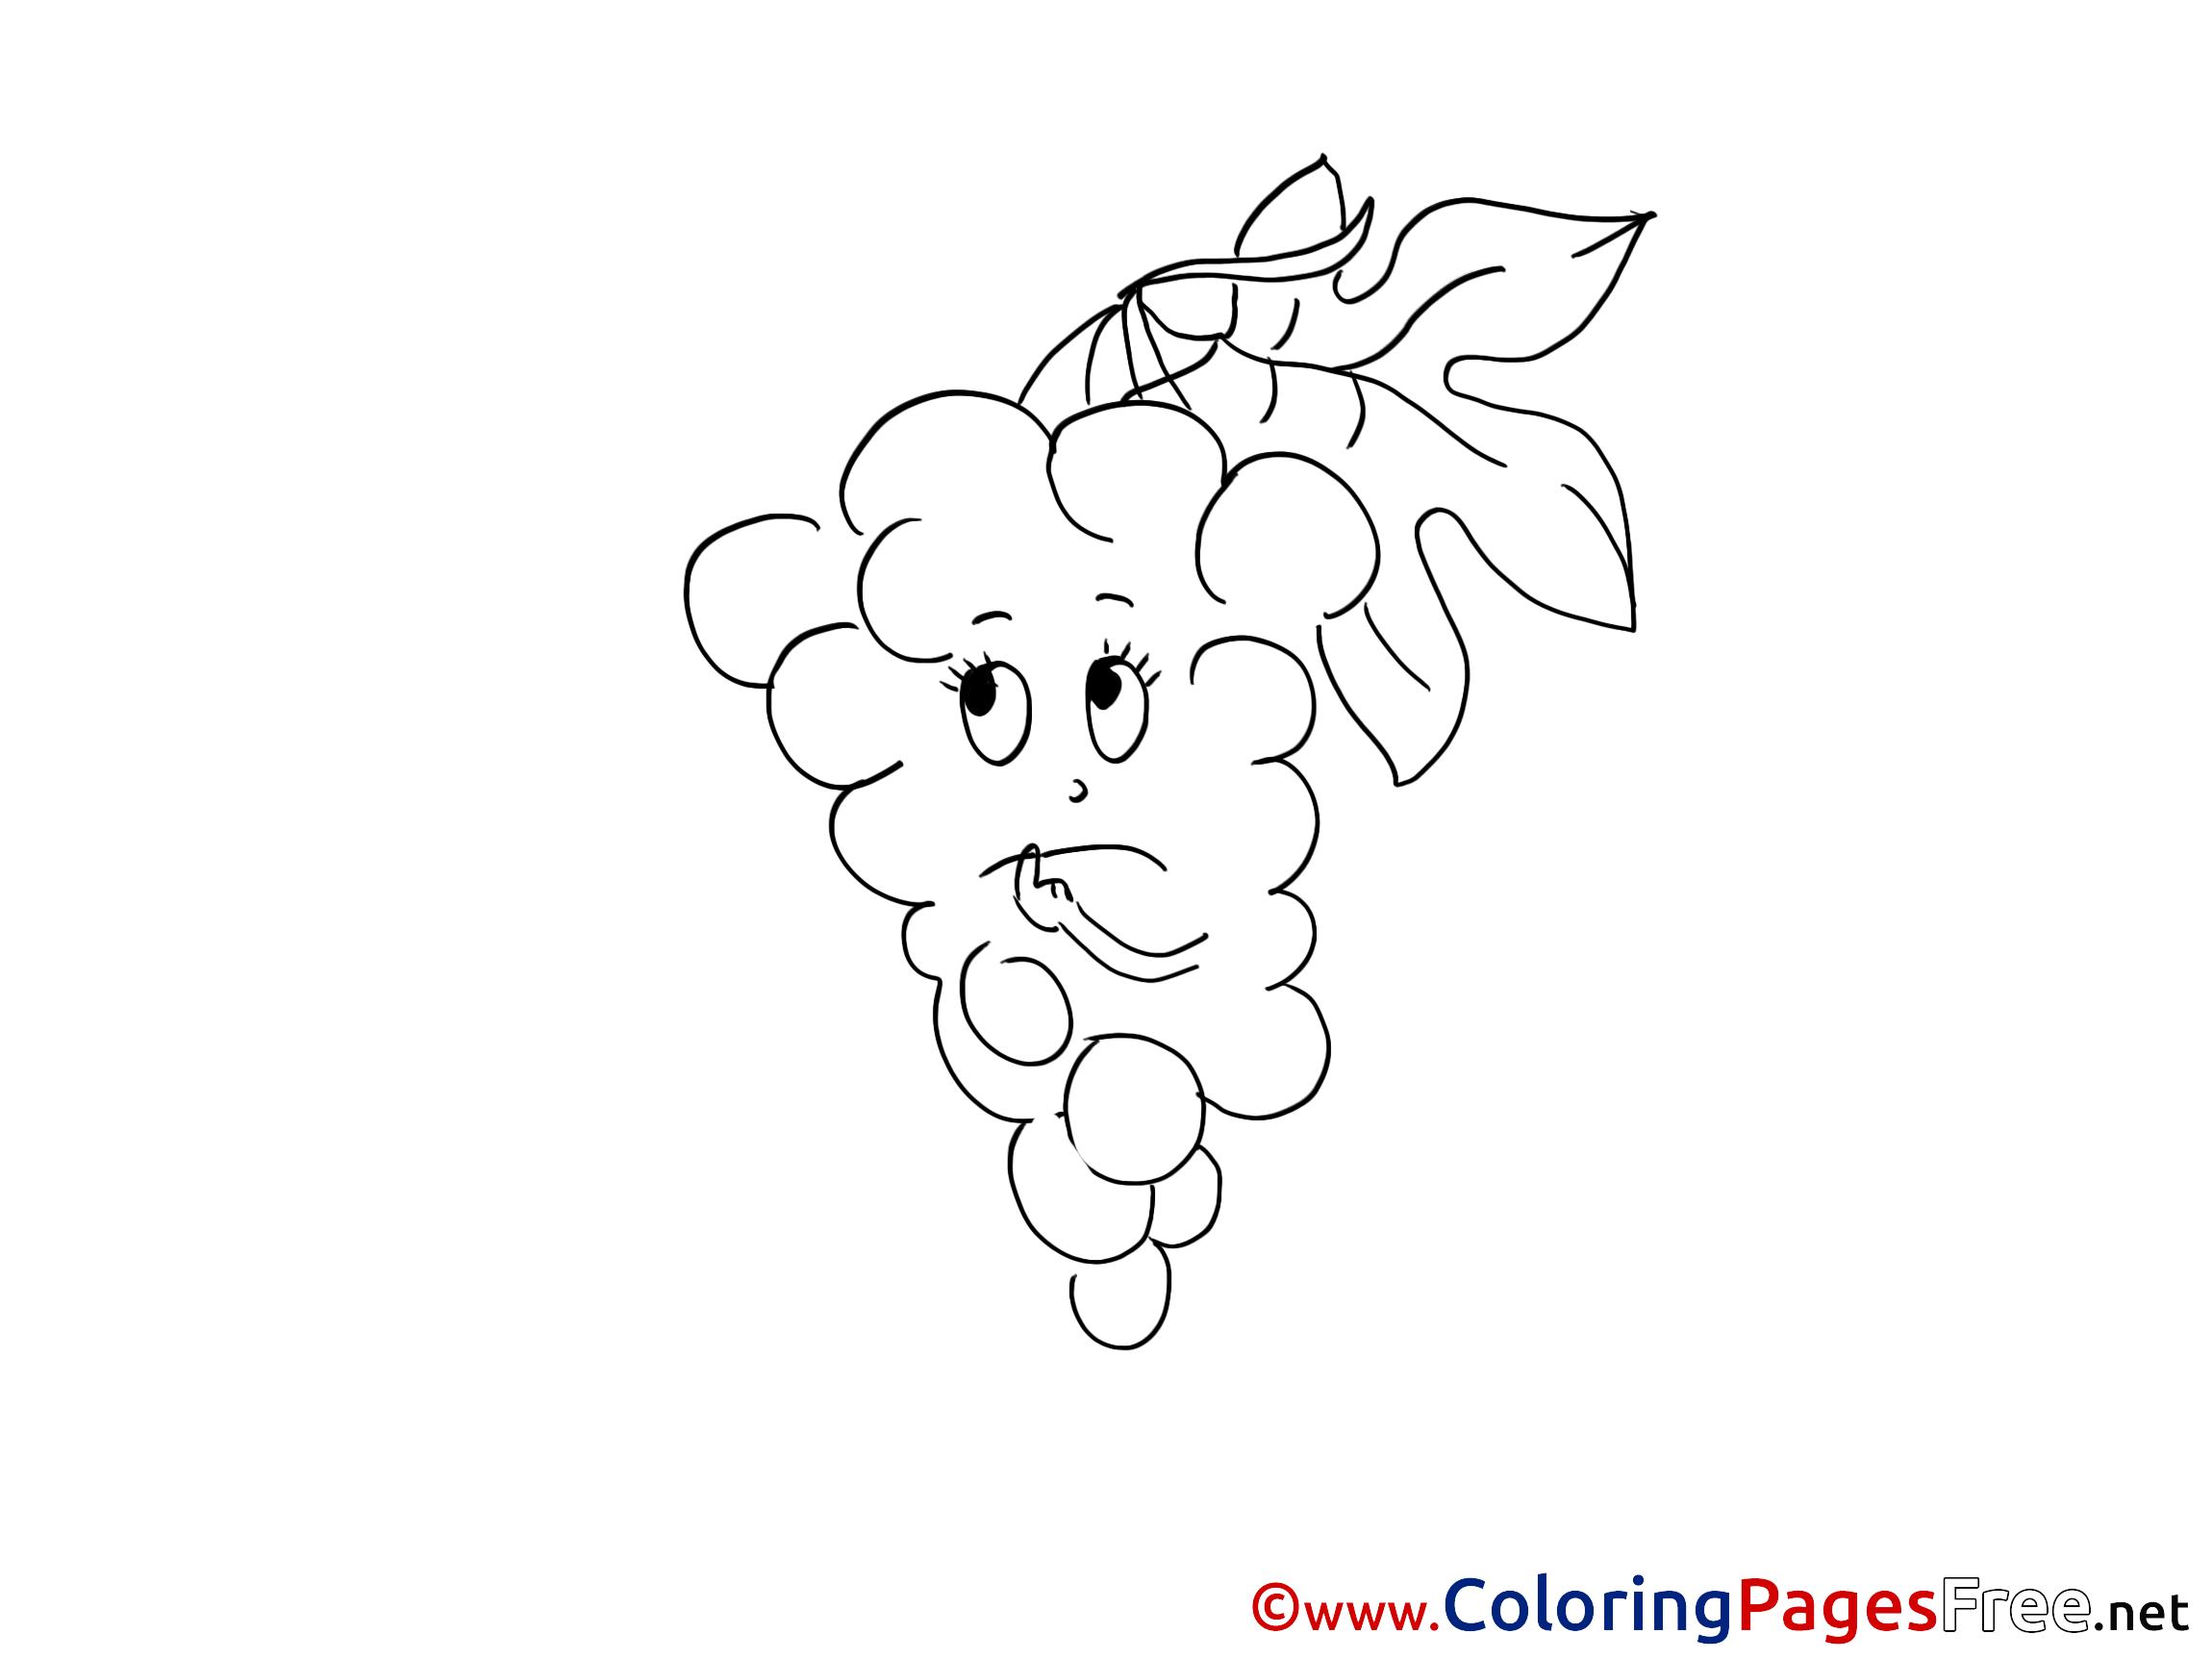 Free coloring page grapes - Free Coloring Page Grapes 24